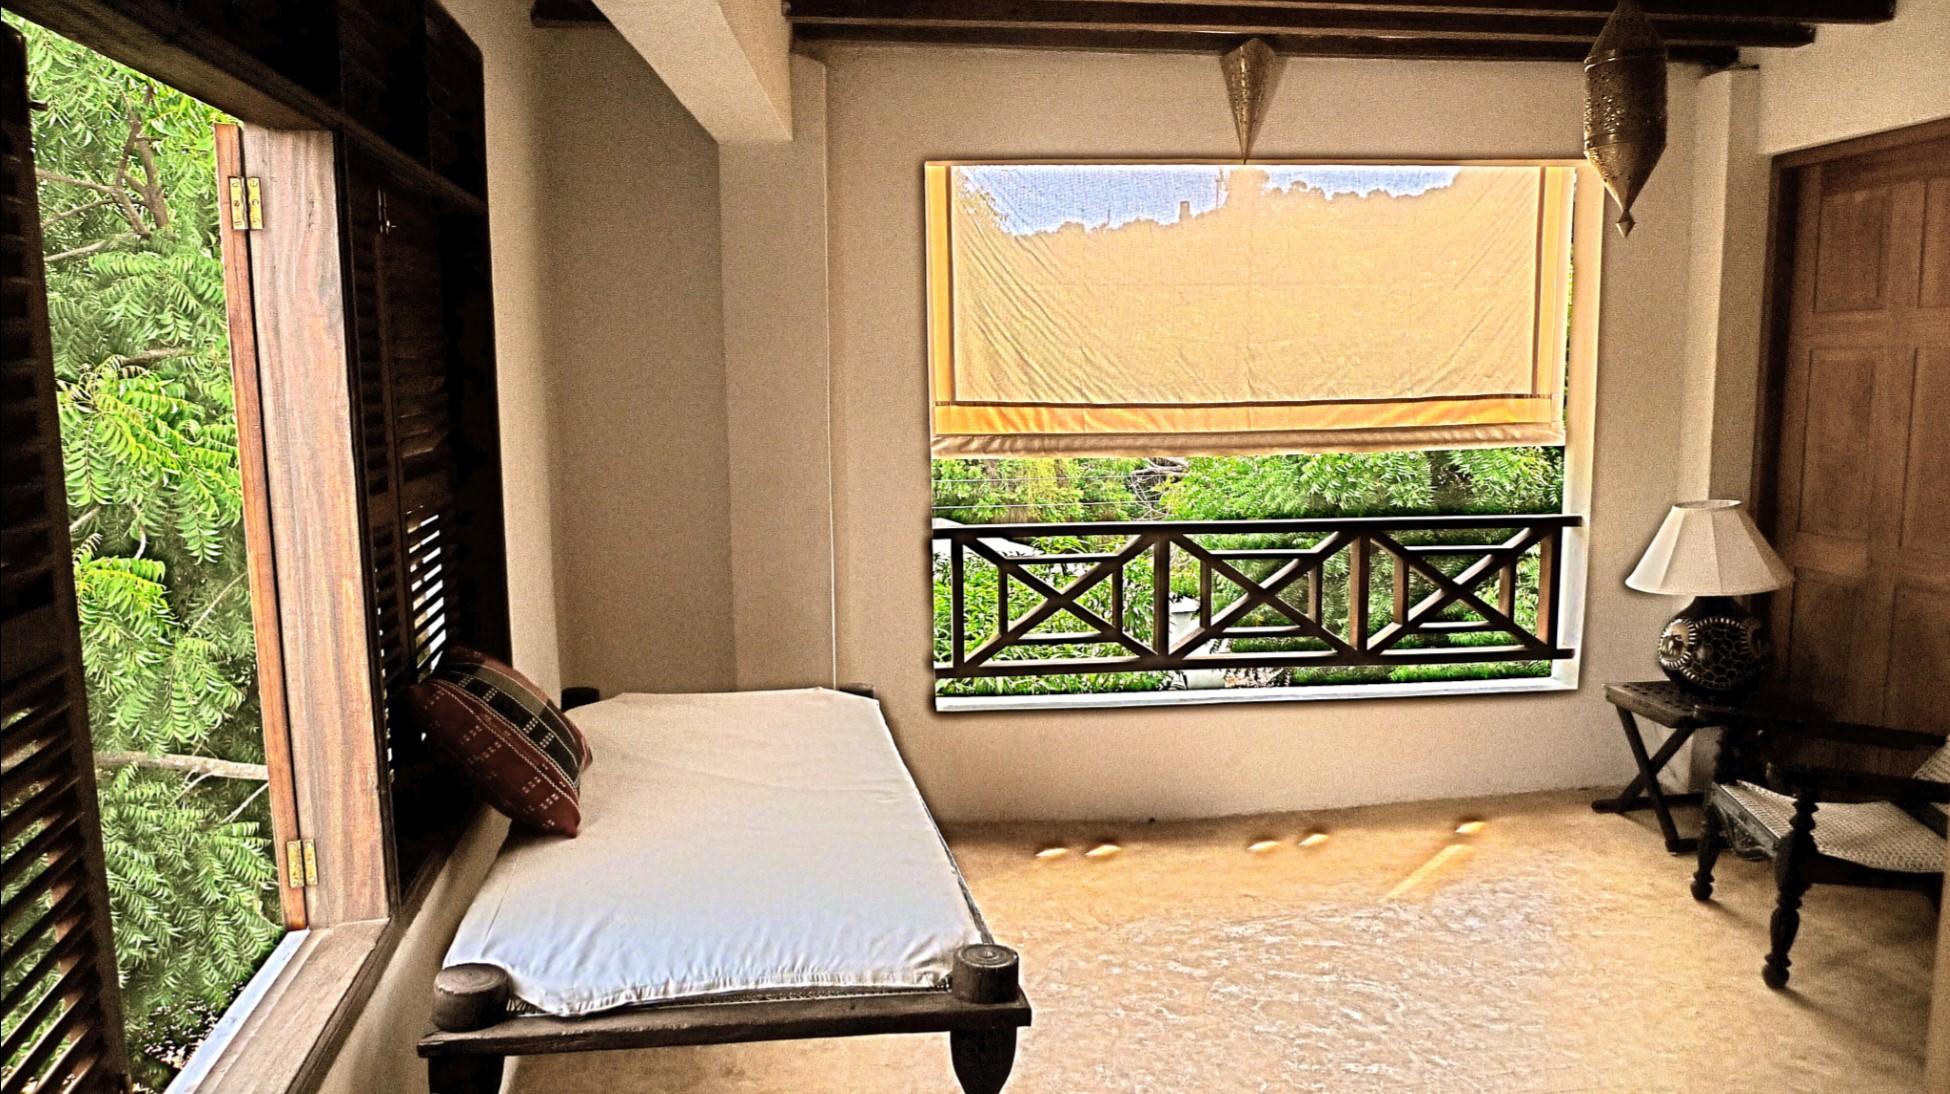 Deule-House-Shela-Lamu-Island-Kenya-Balcony-Dayroom-1